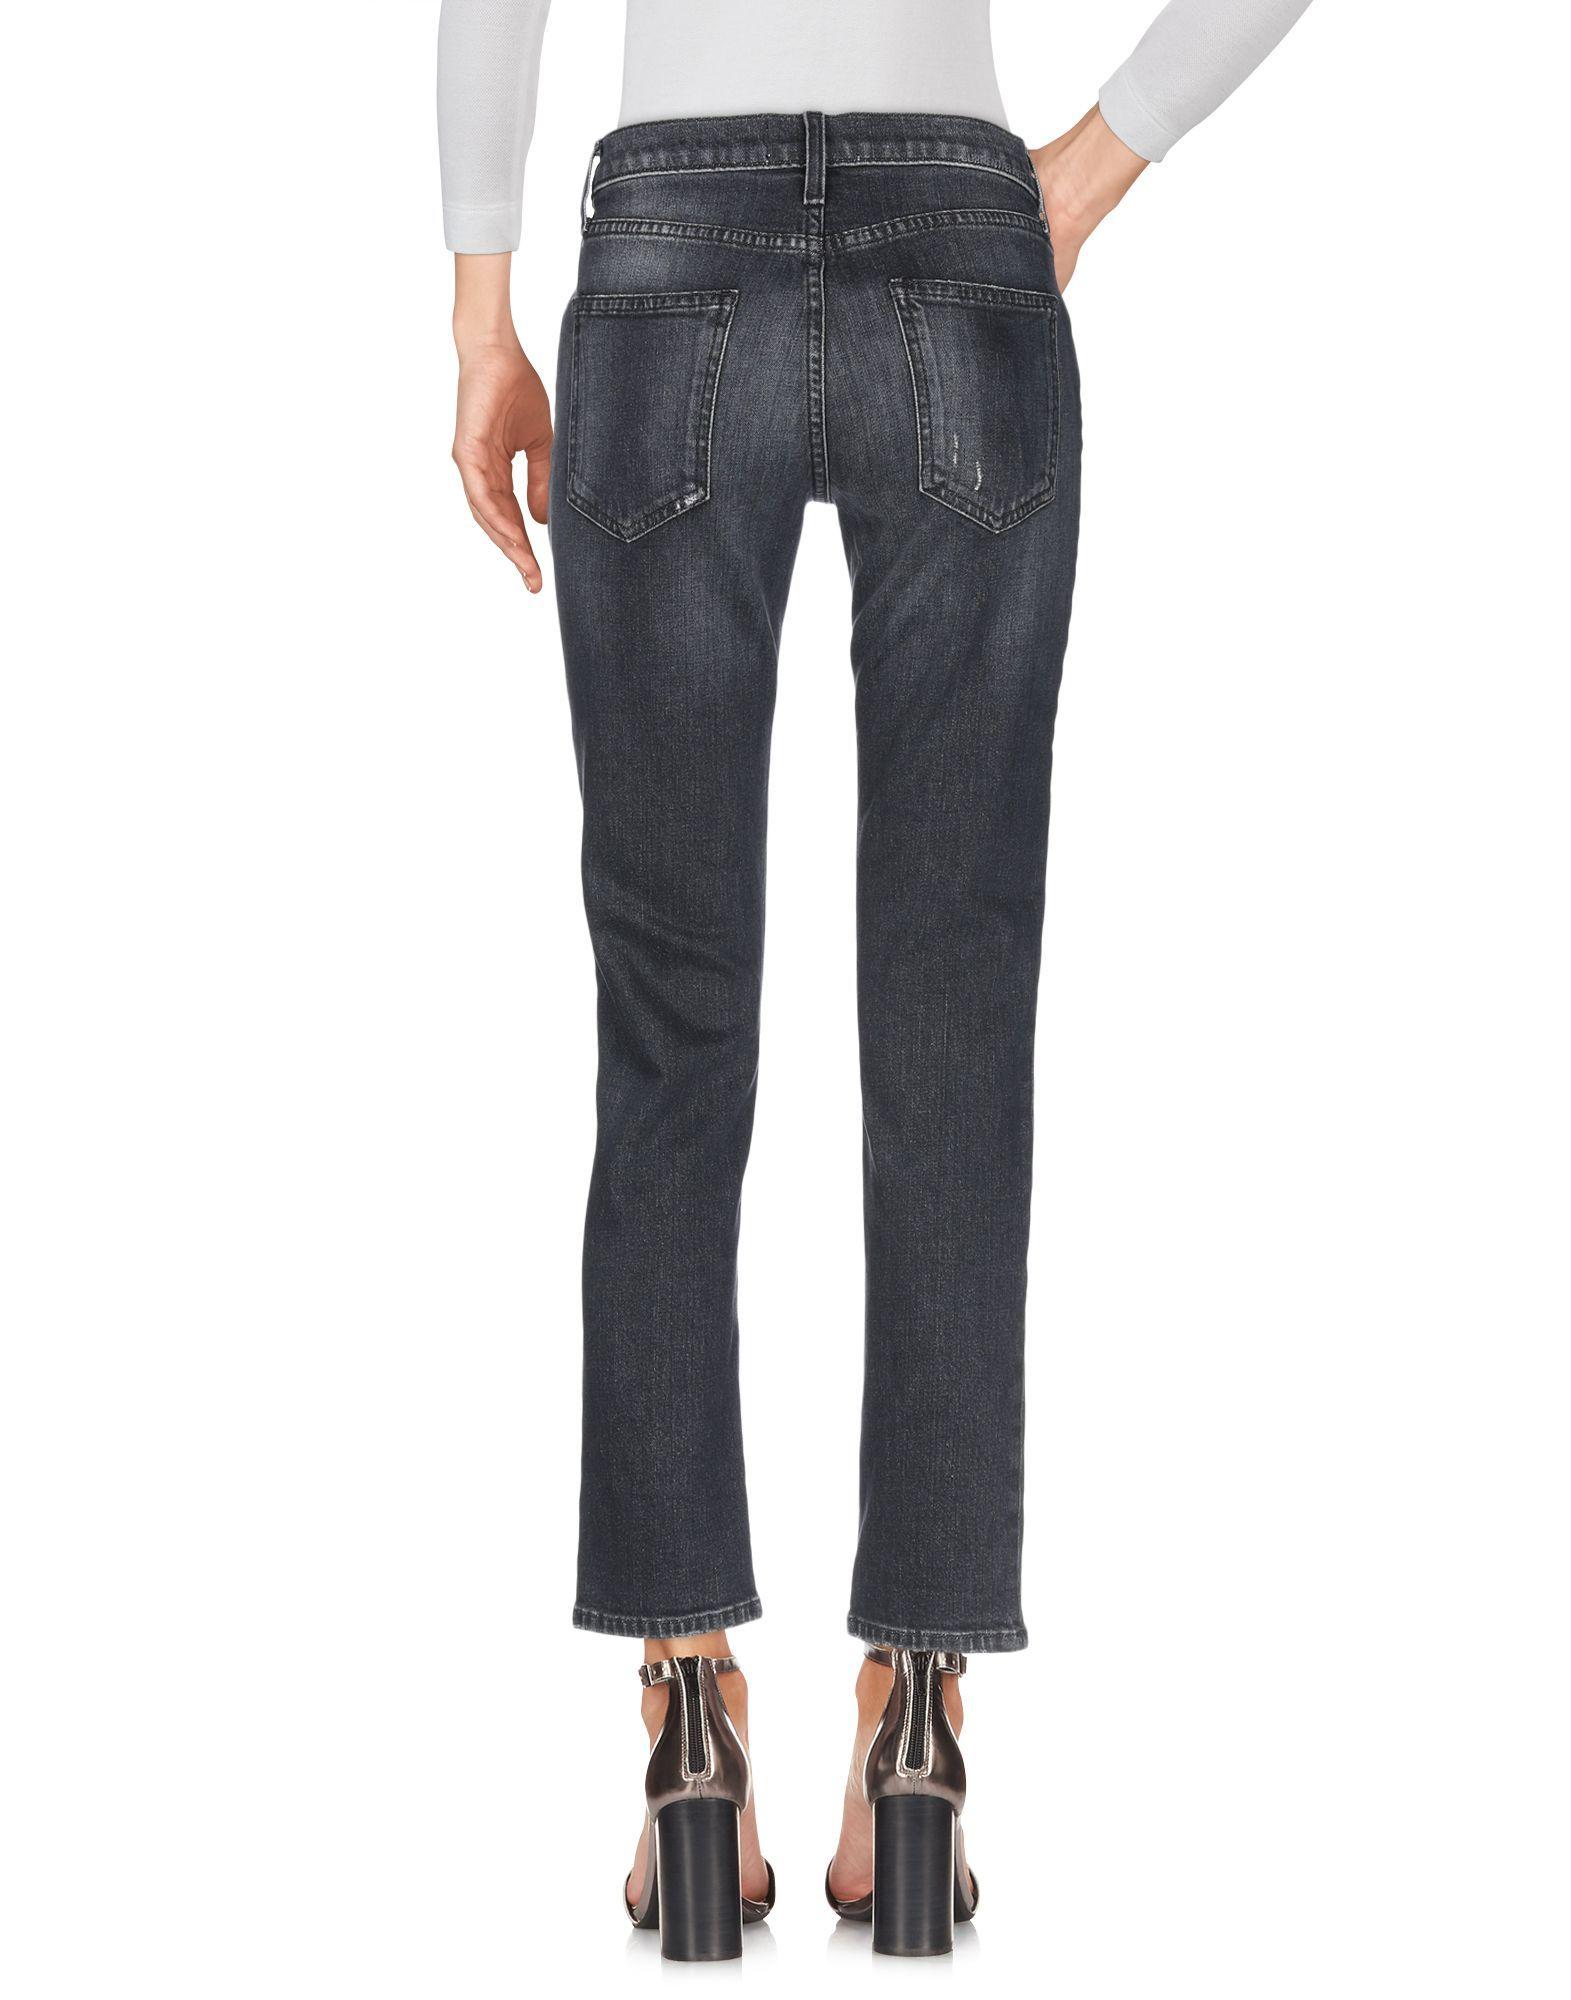 Current/Elliott Steel Grey Cotton Jeans